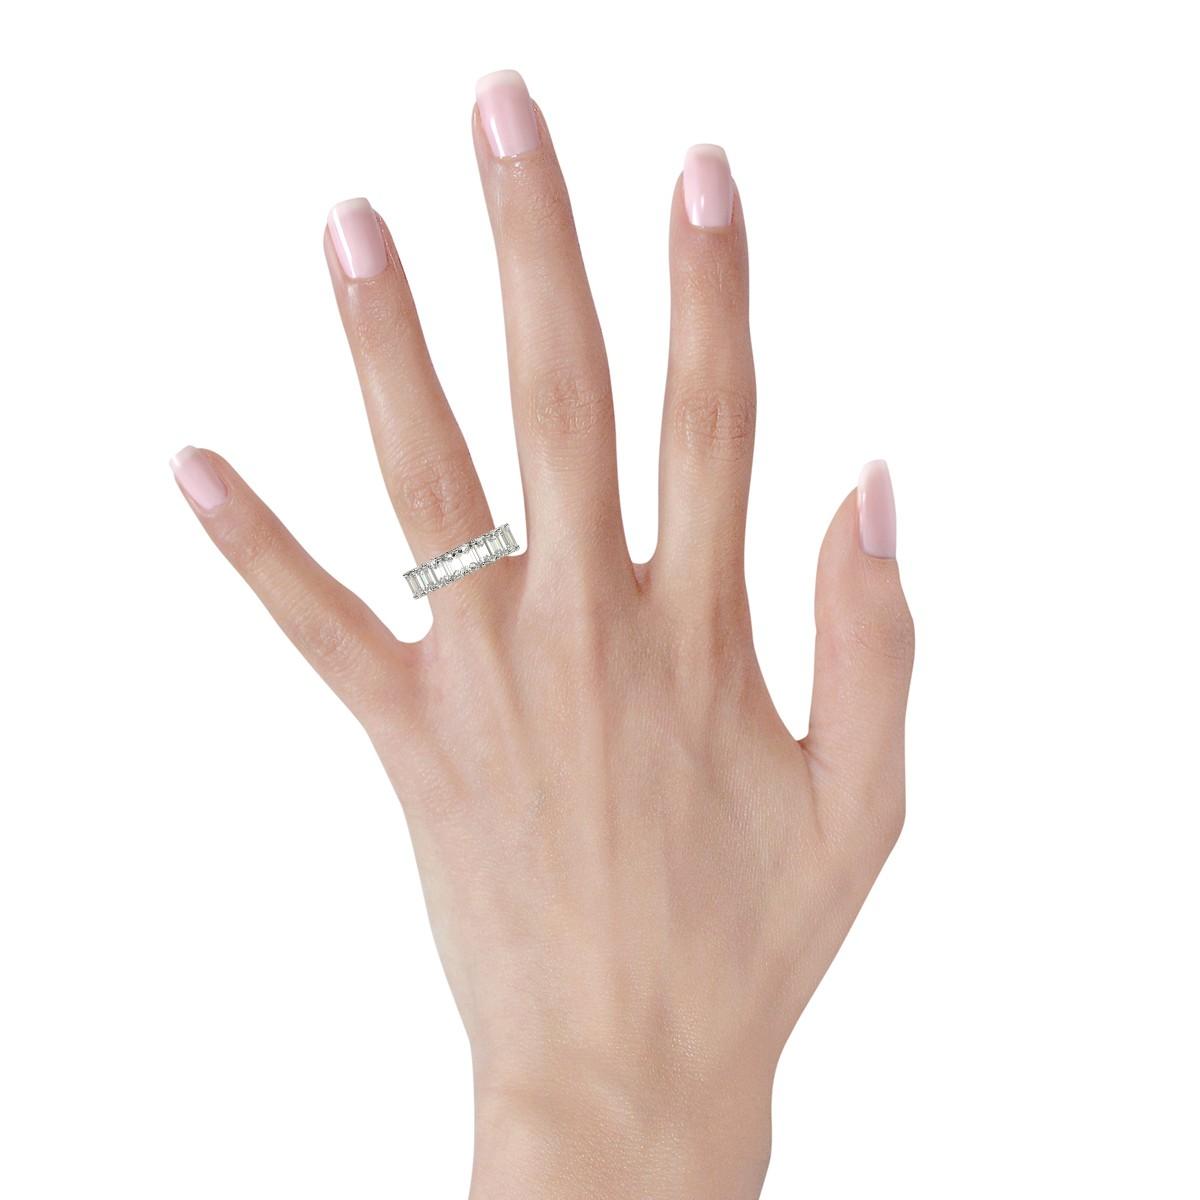 Classic Eternity Ring with Emerald Cut Diamonds in Platinum